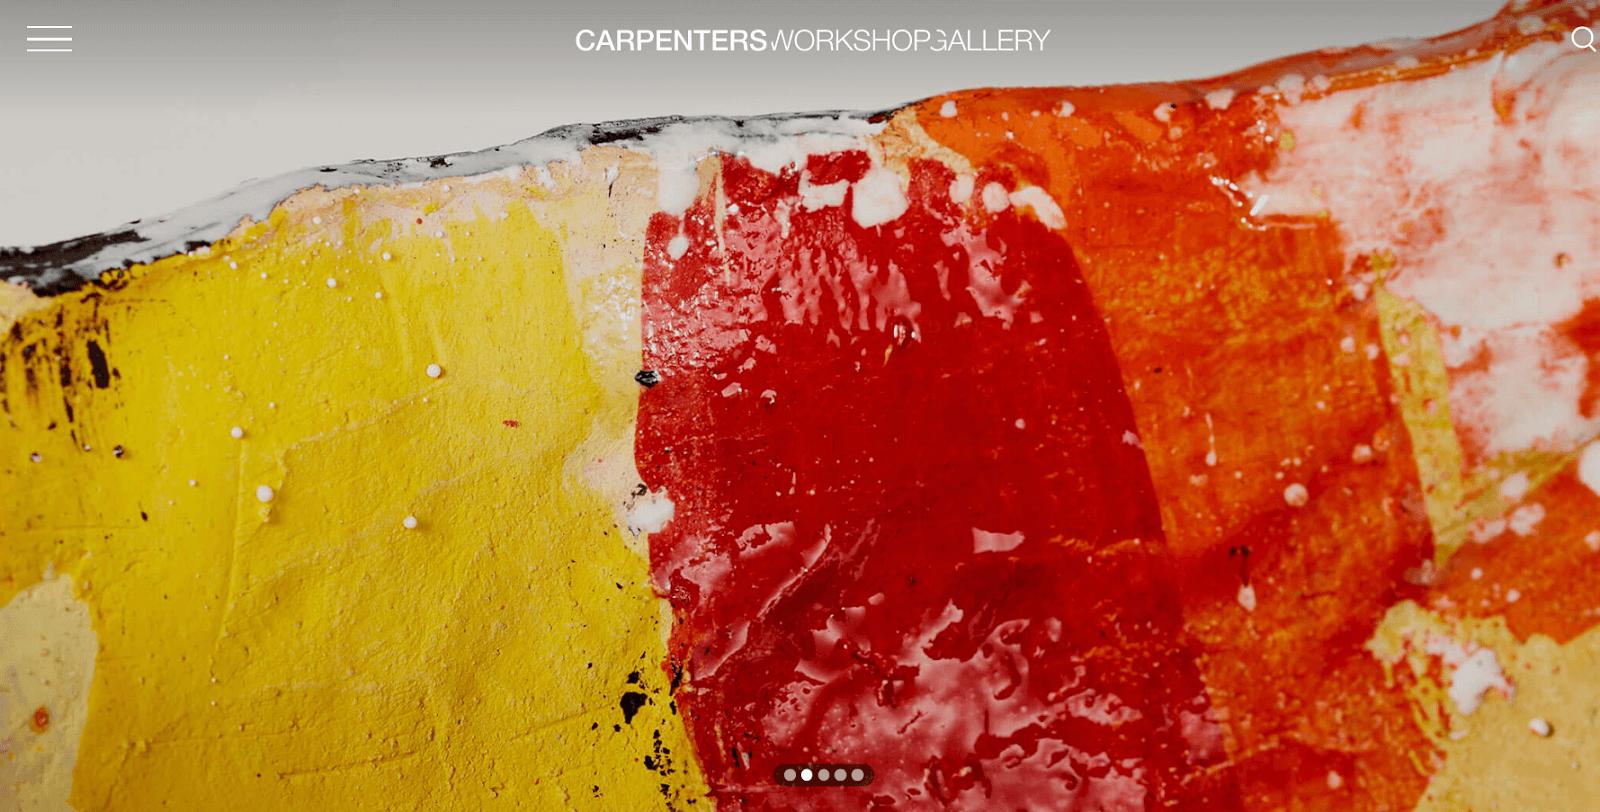 carpentersworkshopgallery Site